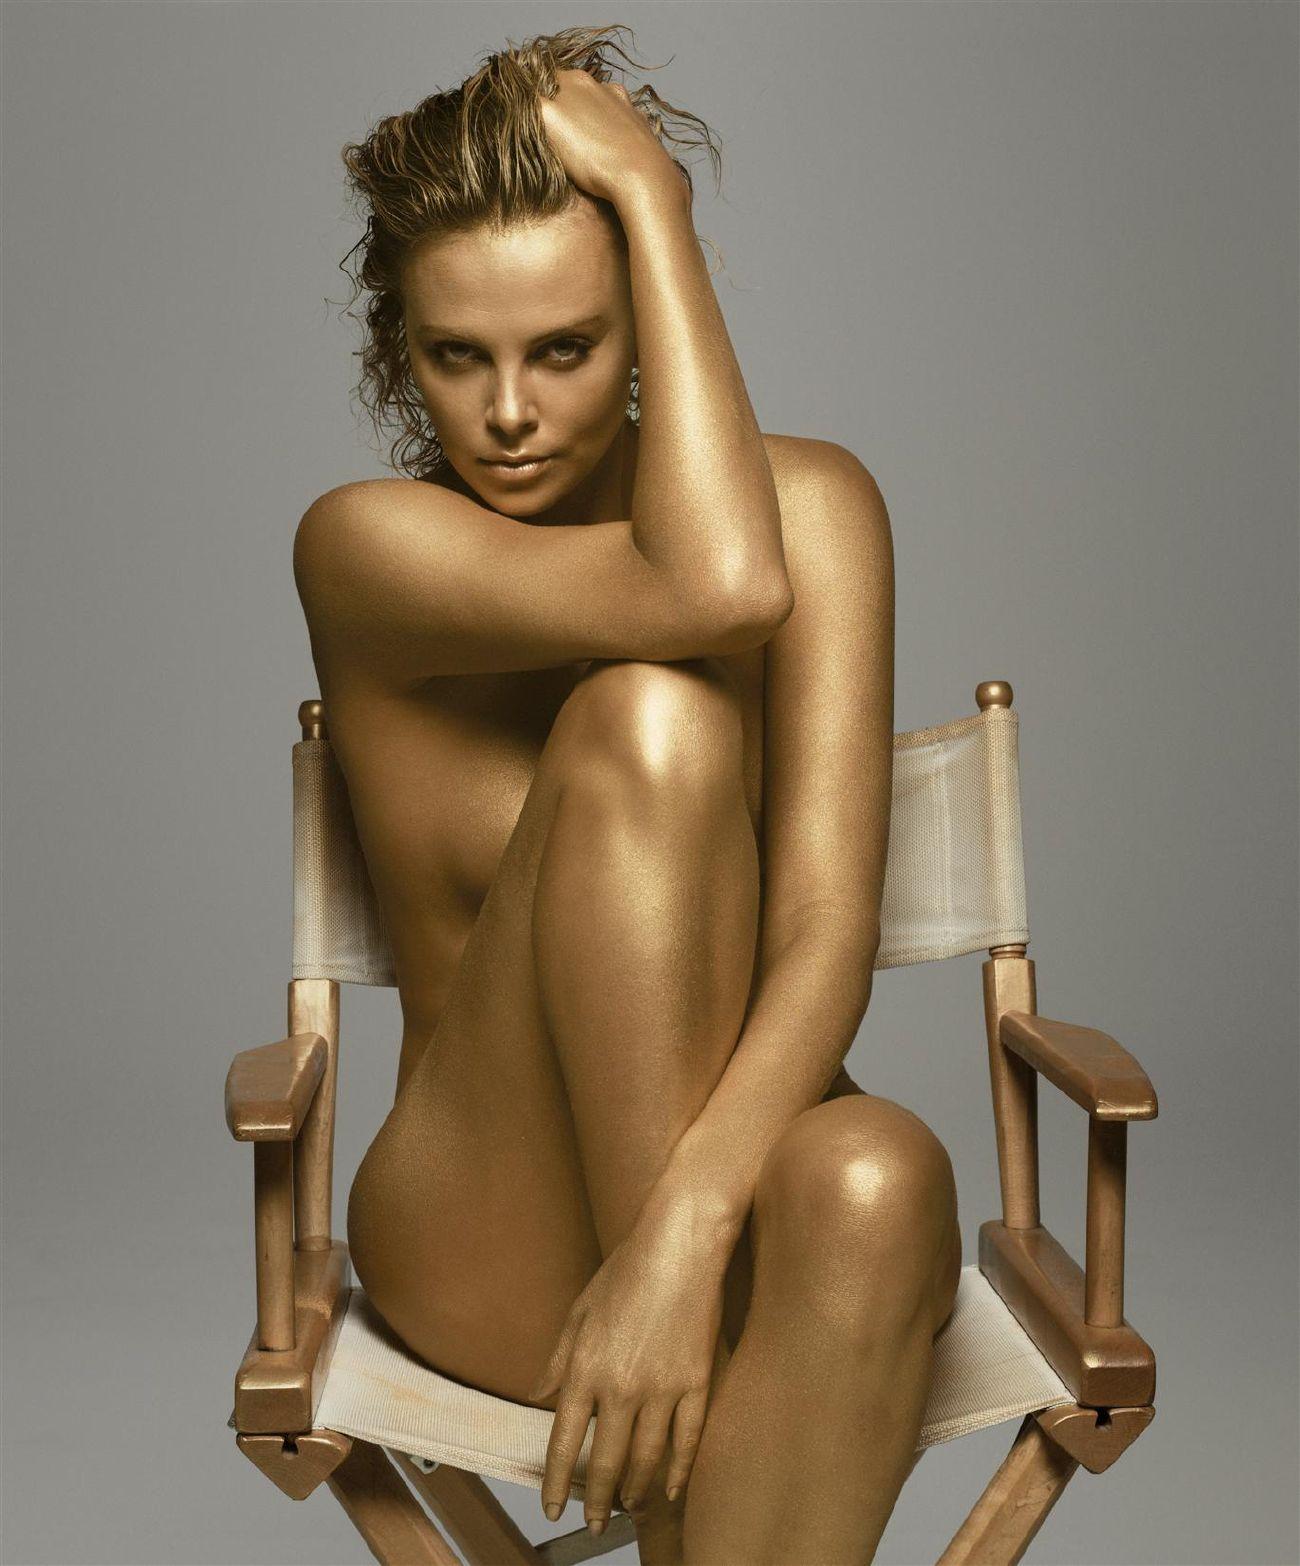 http://4.bp.blogspot.com/-ENlBboPV_ZI/UBaEnJ8BQSI/AAAAAAAAACA/uVYVMIcDKD4/s1600/charlize-theron-naked-5.jpg